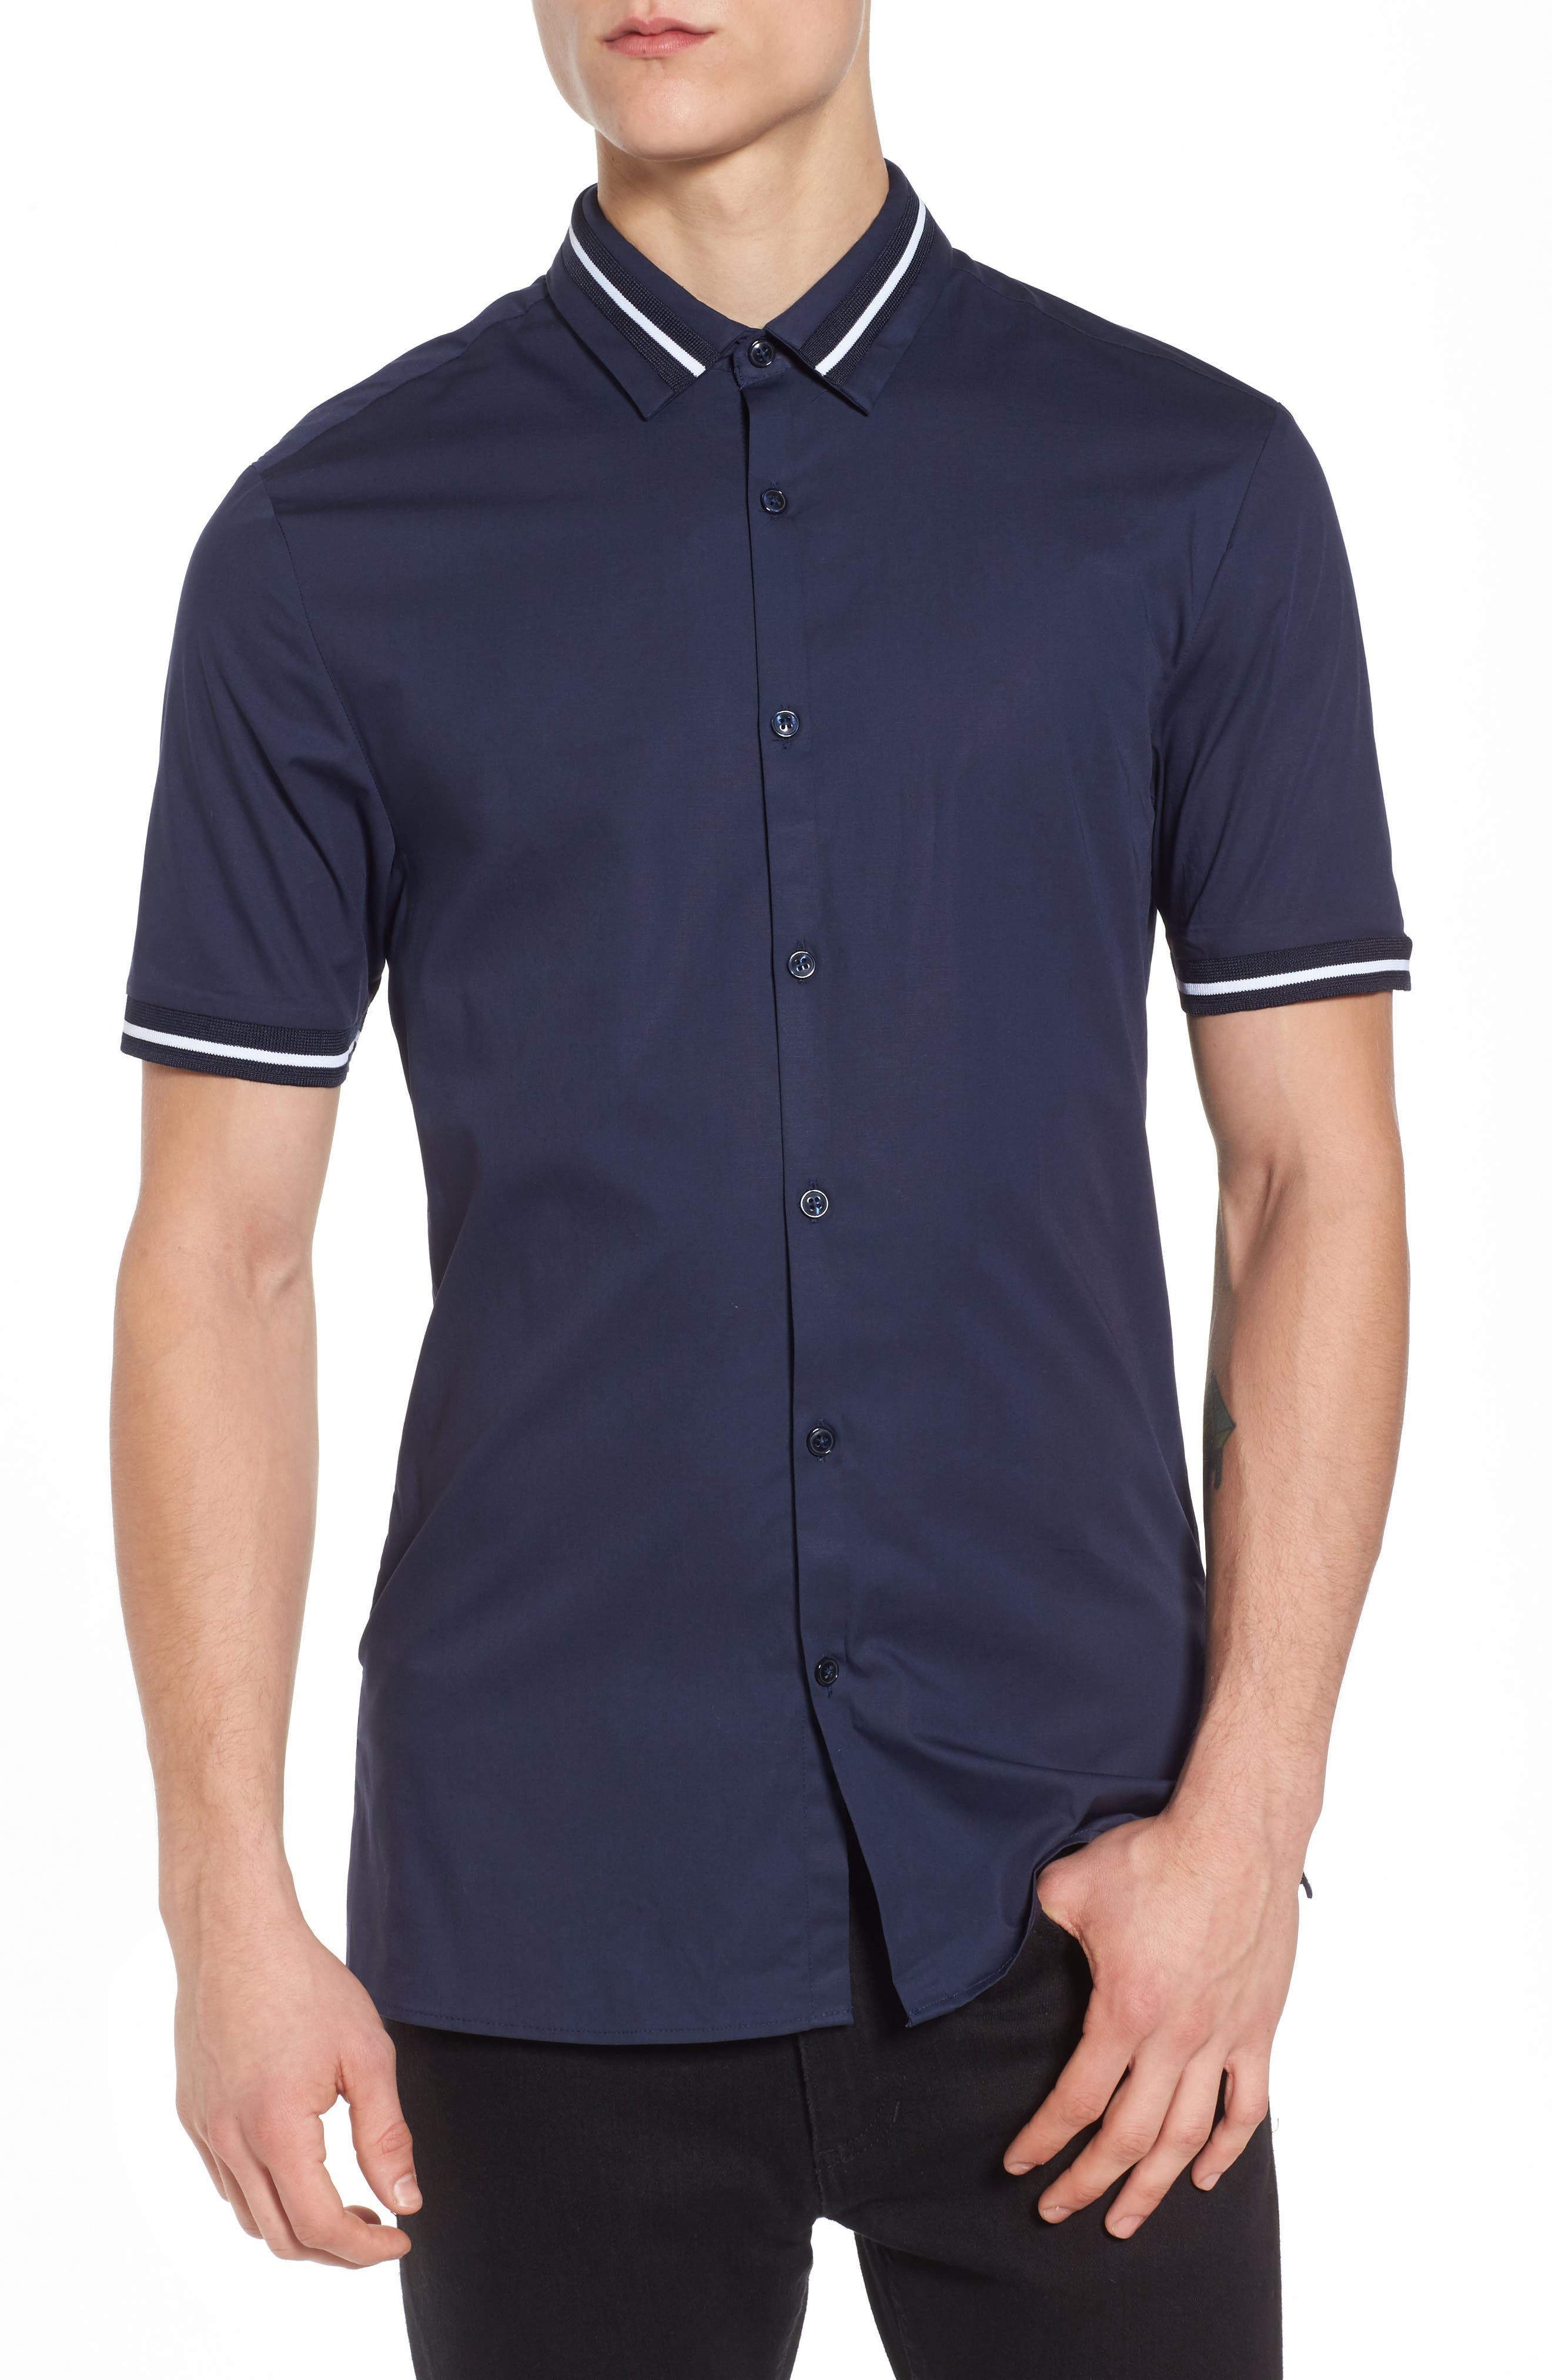 Main Image - Topman Muscle Fit Stripe Tipped Shirt